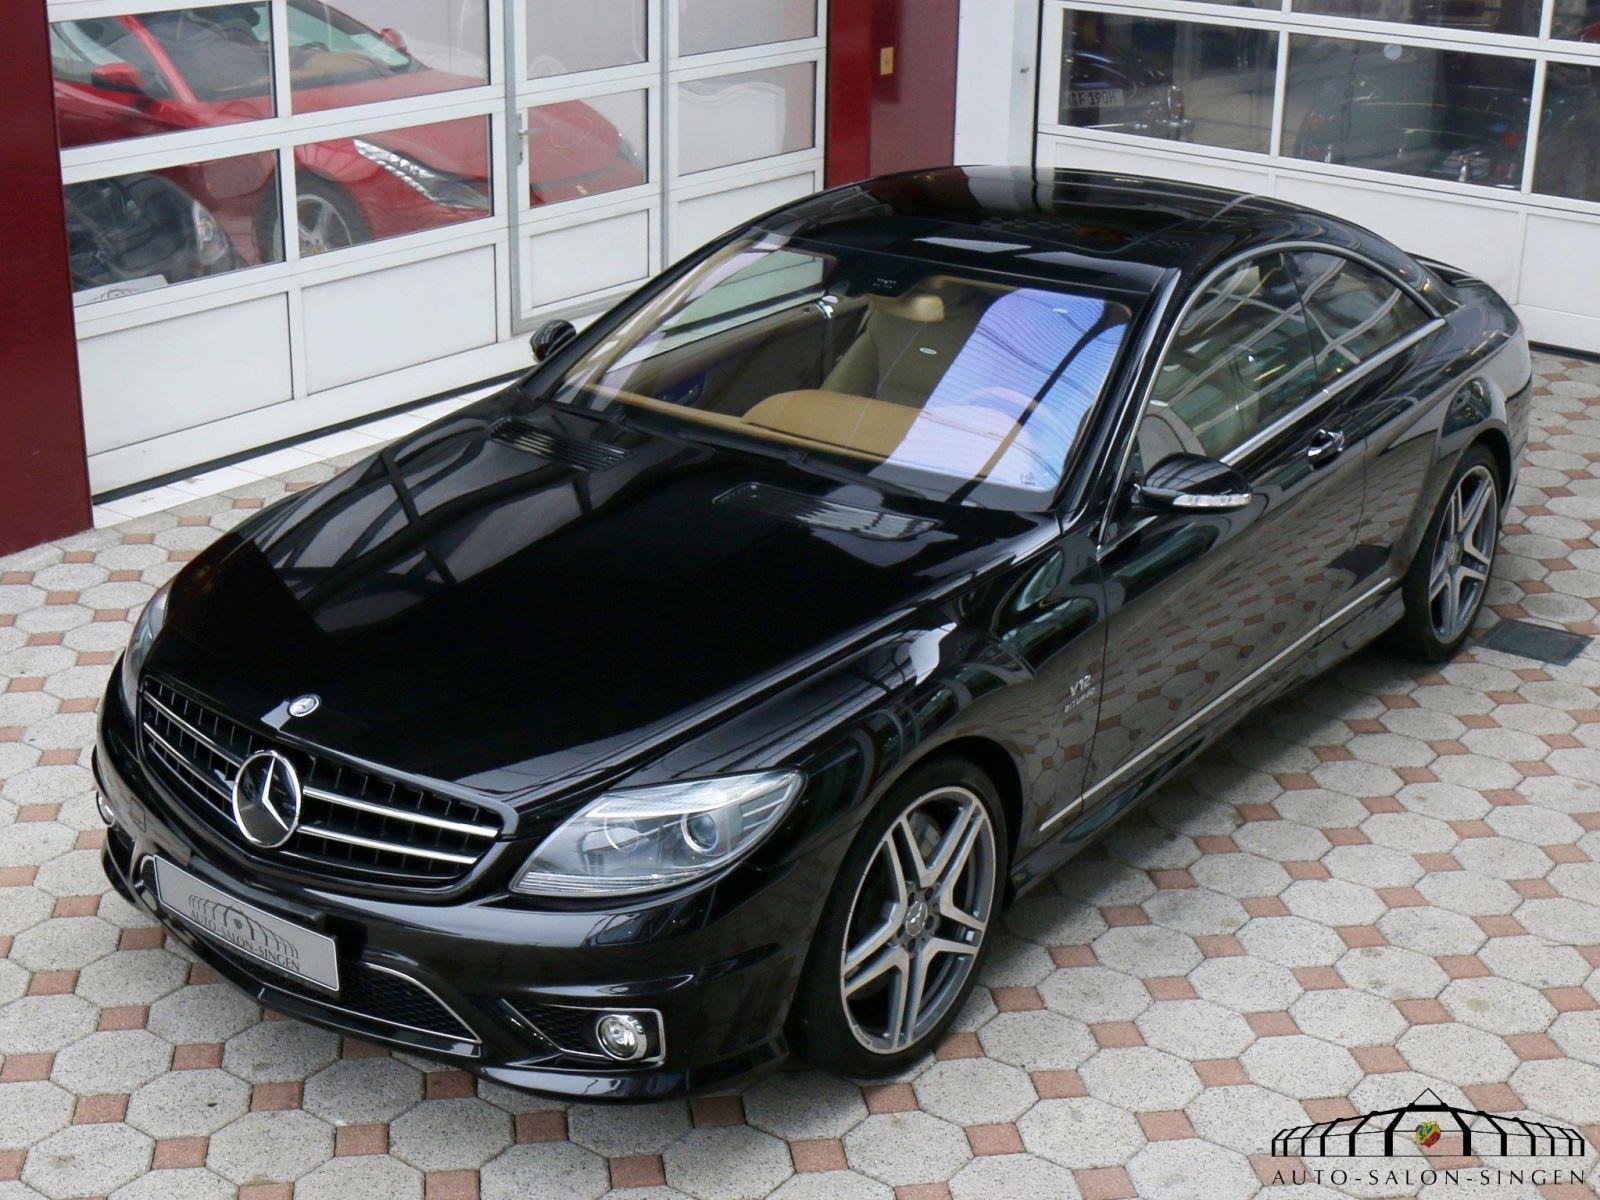 Mercedes-Benz CL 65 AMG Coupé